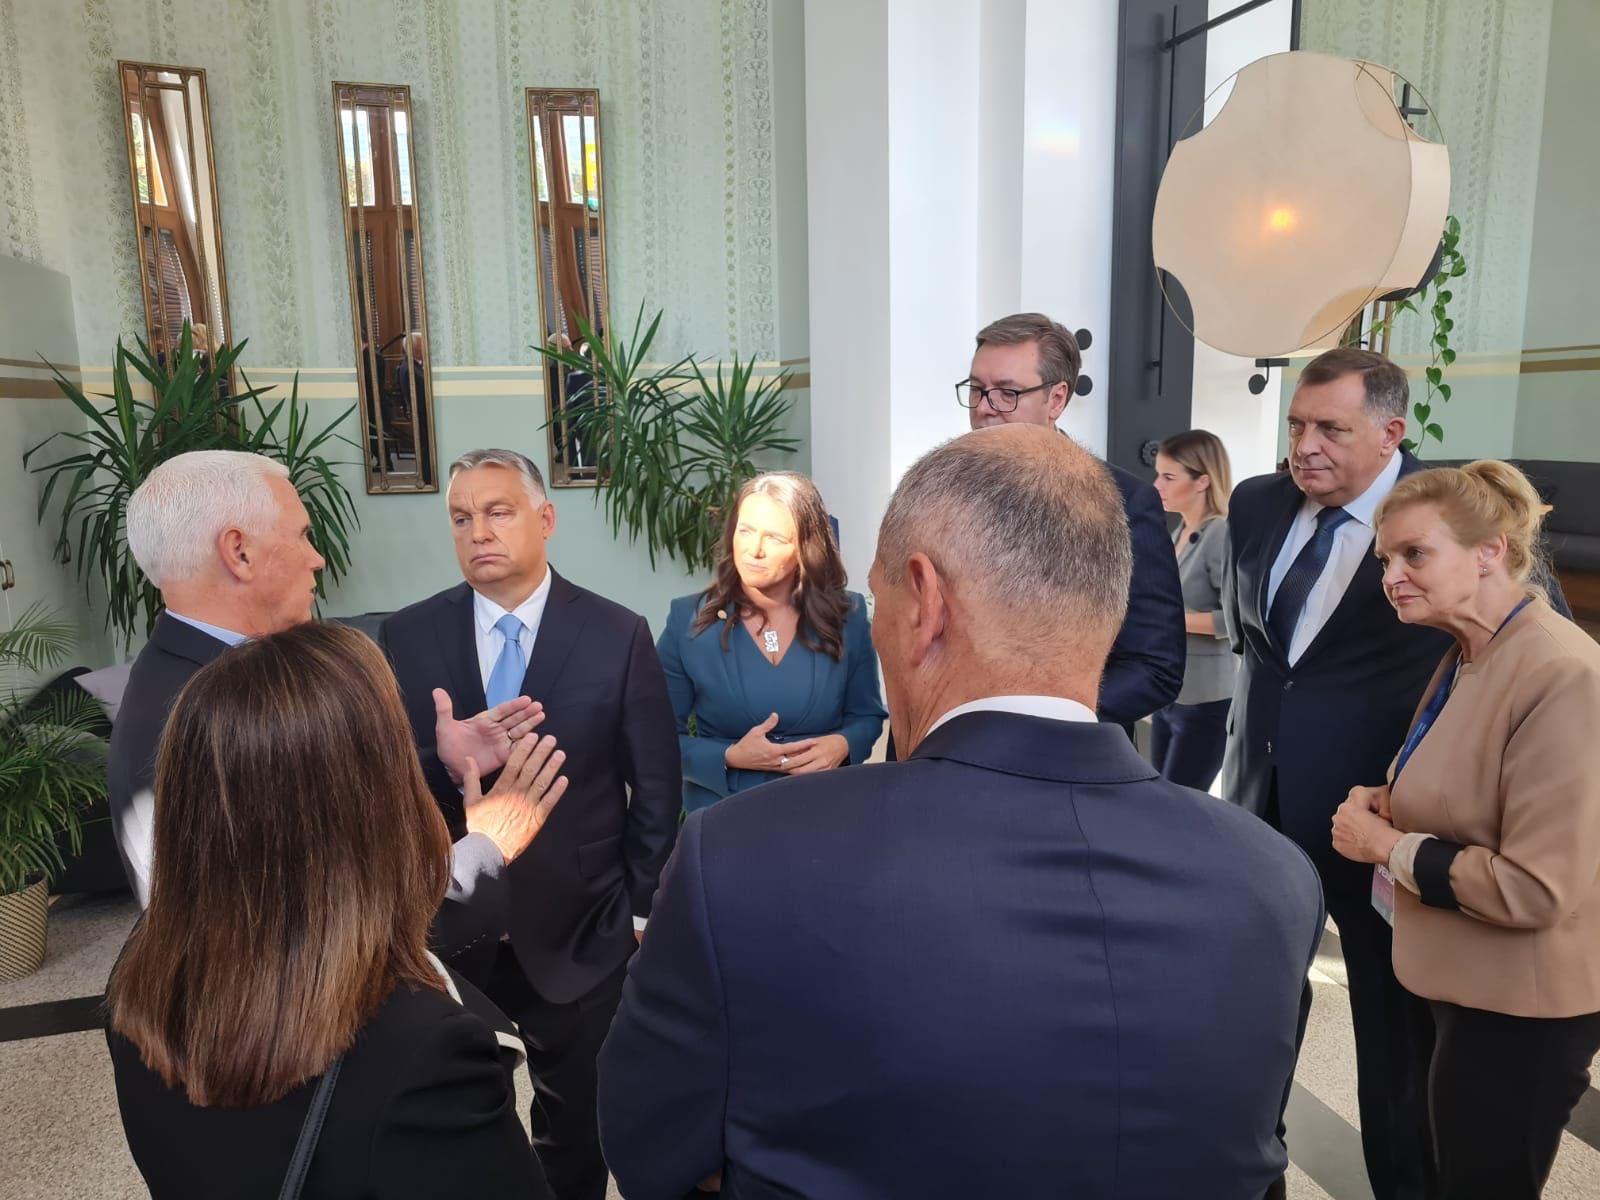 Dodik sa Janšom i Orbanom na desničarskom summitu u Budimpešti - Page 2 E_9AkWxXMAIXT5w?format=jpg&name=large